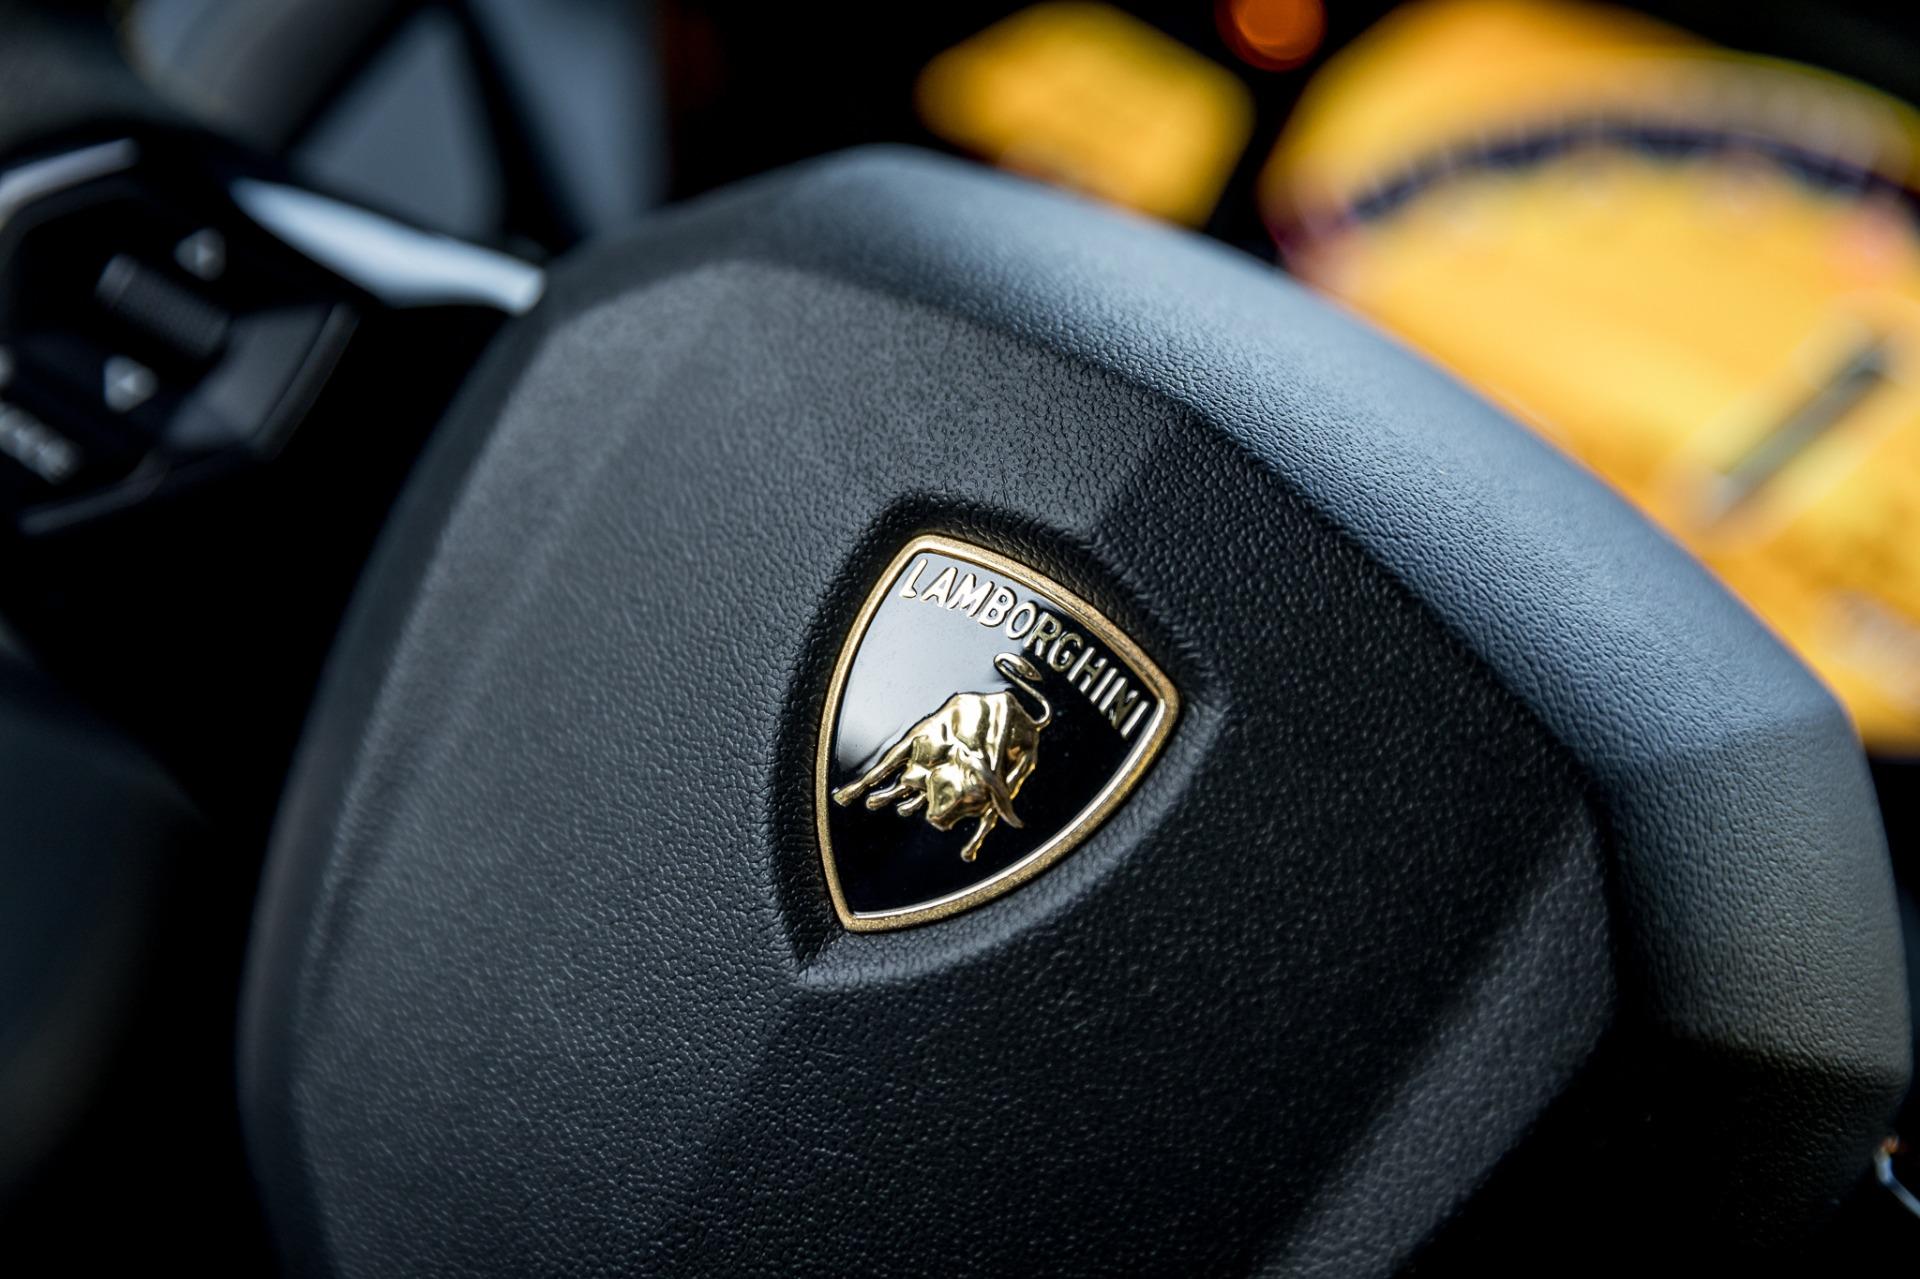 Used 2017 Lamborghini Aventador LP 750-4 SV / 740HP / AWD / 1930 MI / NAV / CAMERA for sale Sold at Formula Imports in Charlotte NC 28227 50